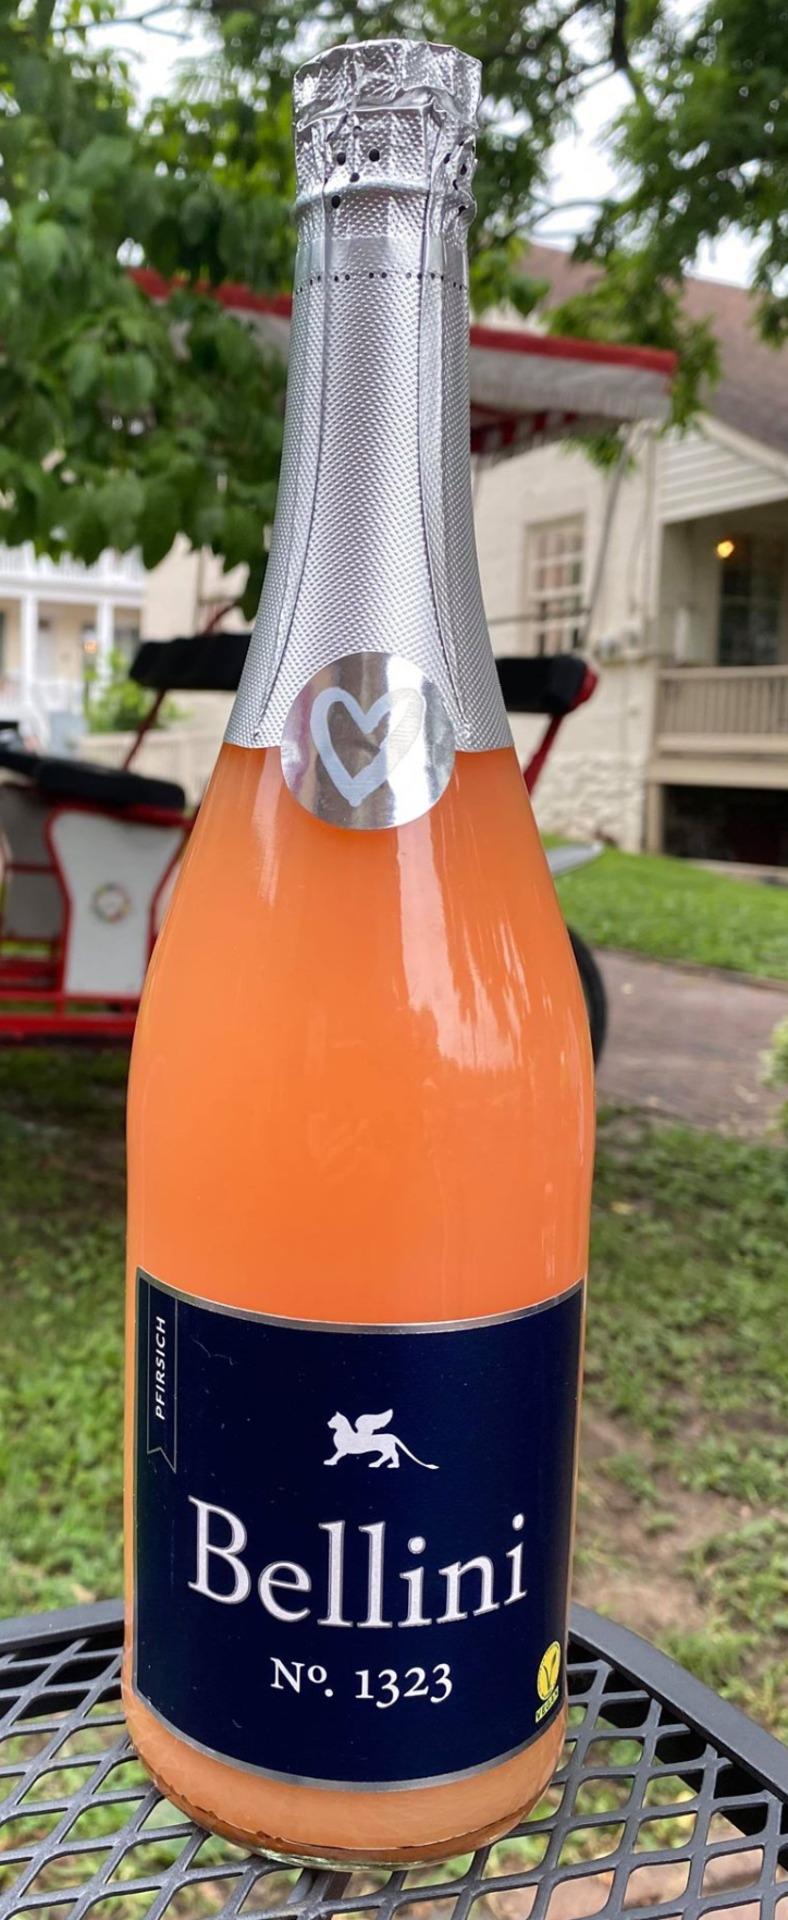 Bottle Bellini Image